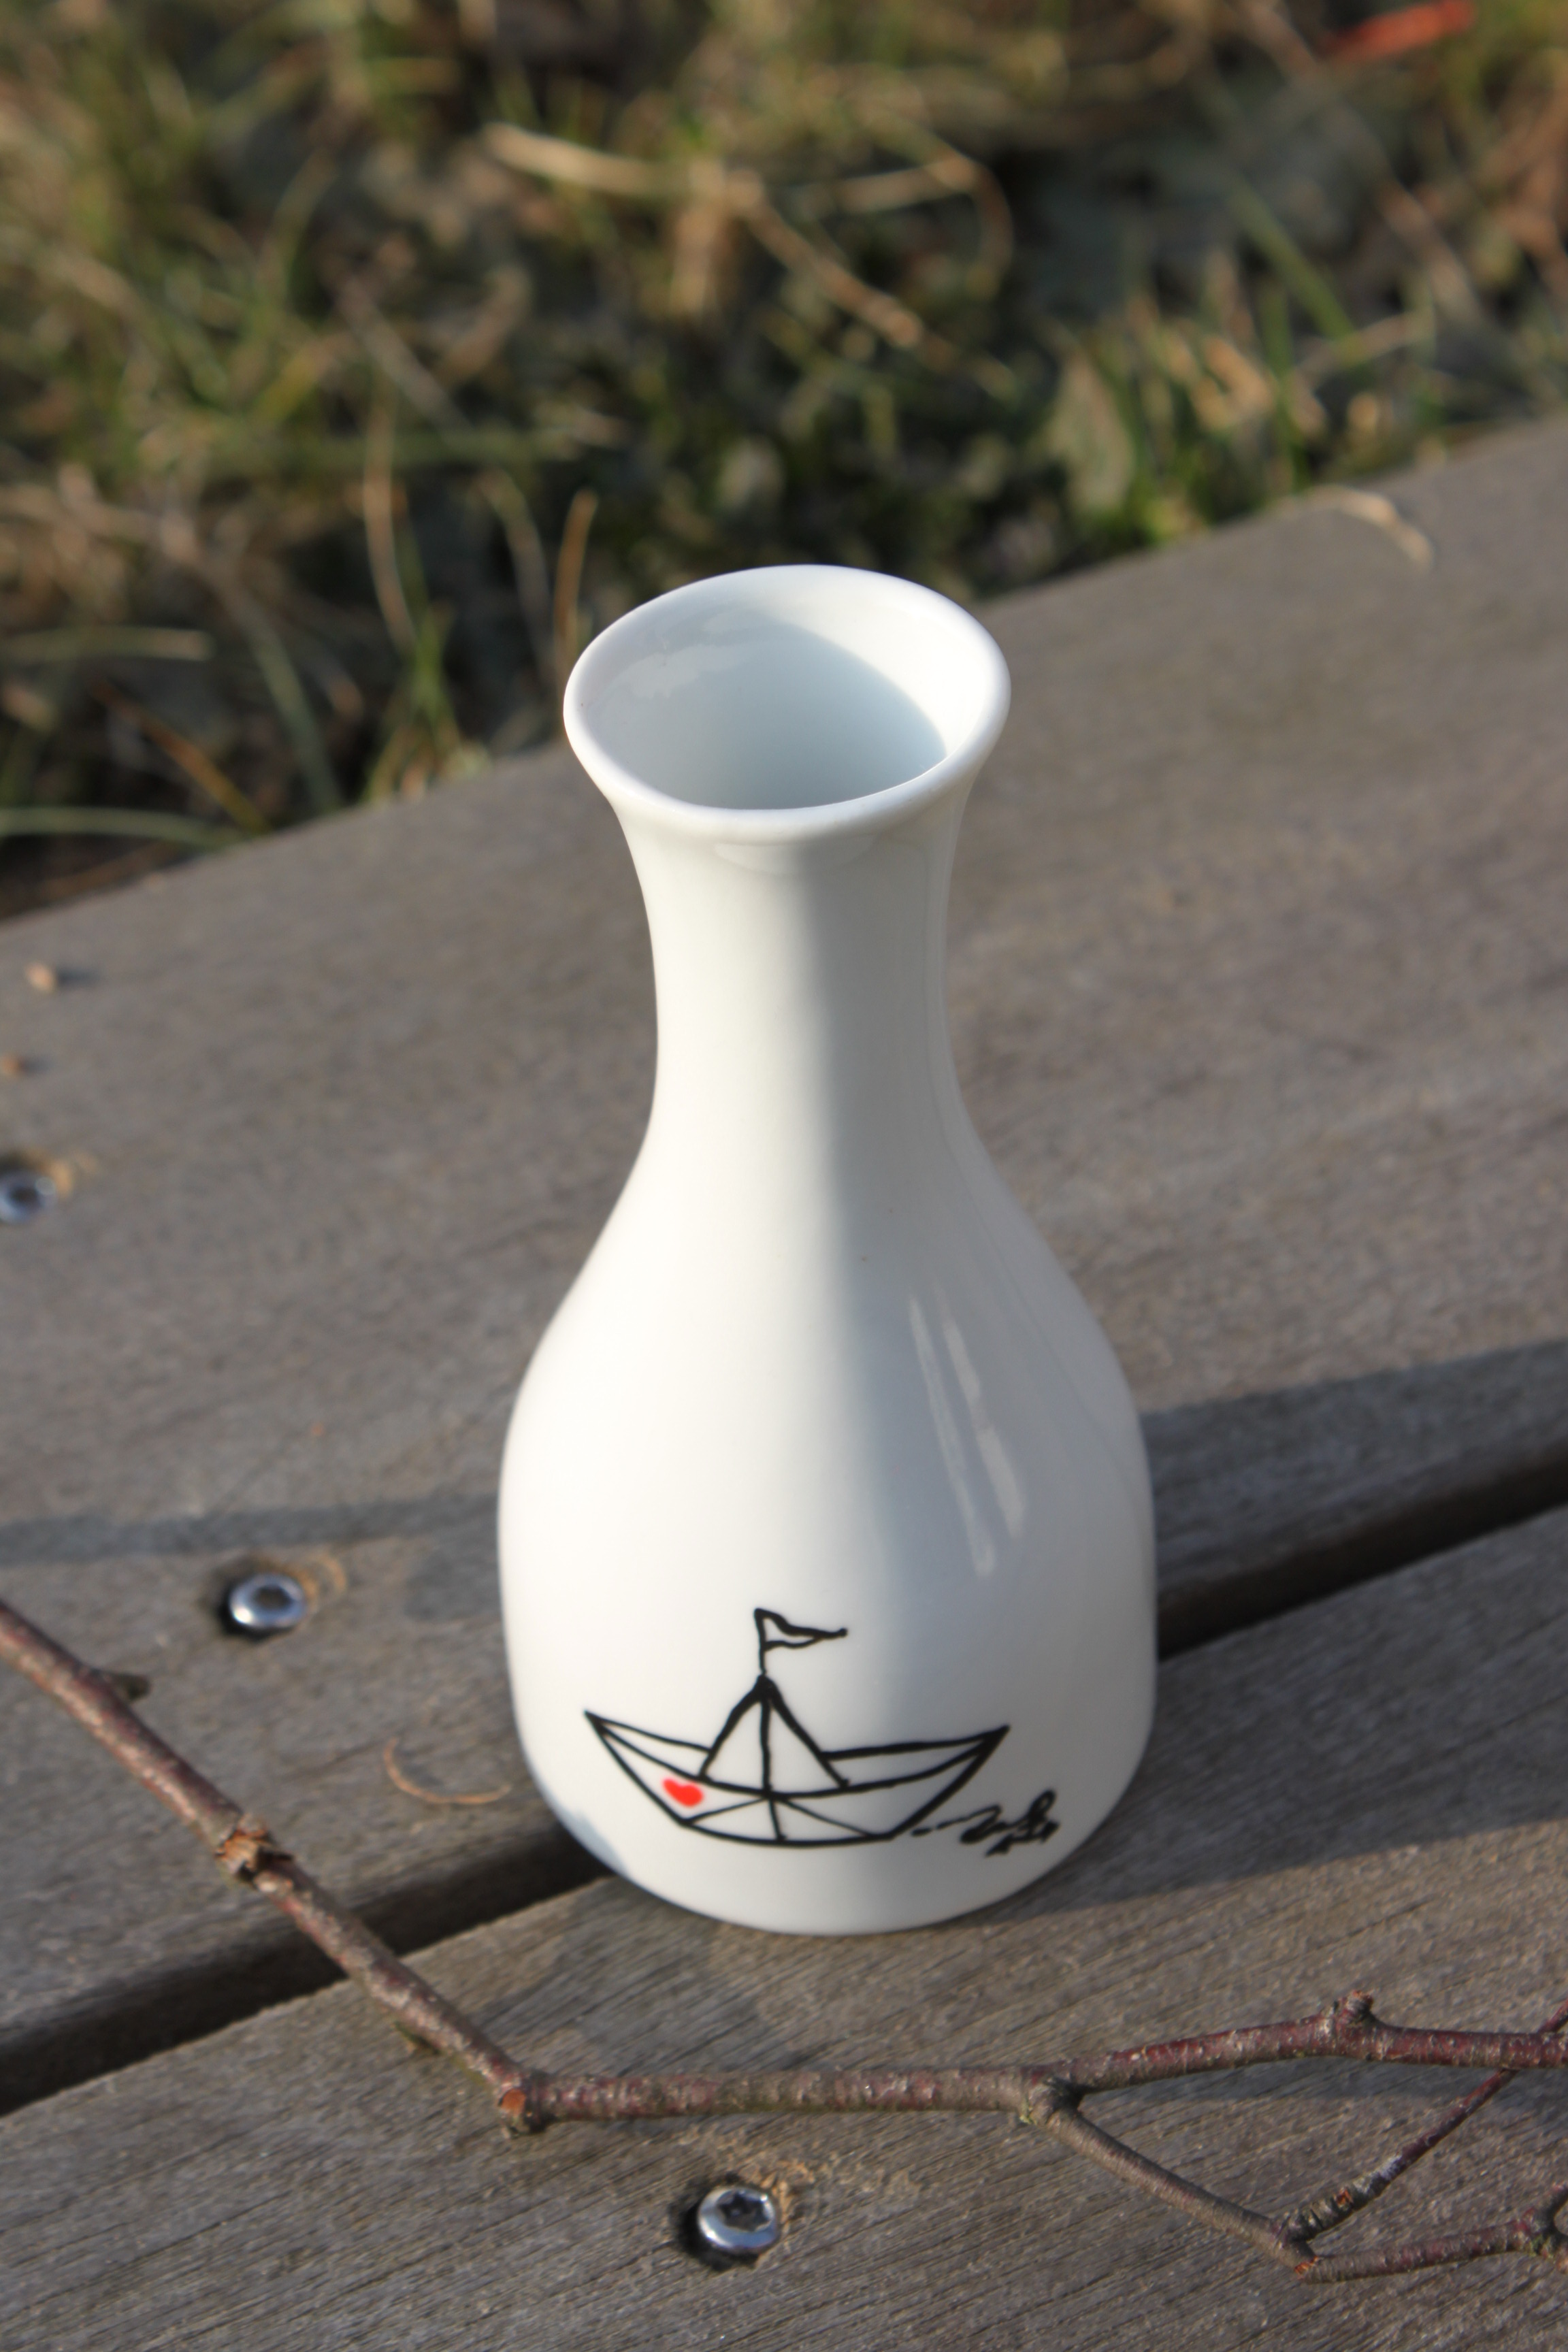 vase etagere teller gebohrt bohren maritim anker möwen ahoi